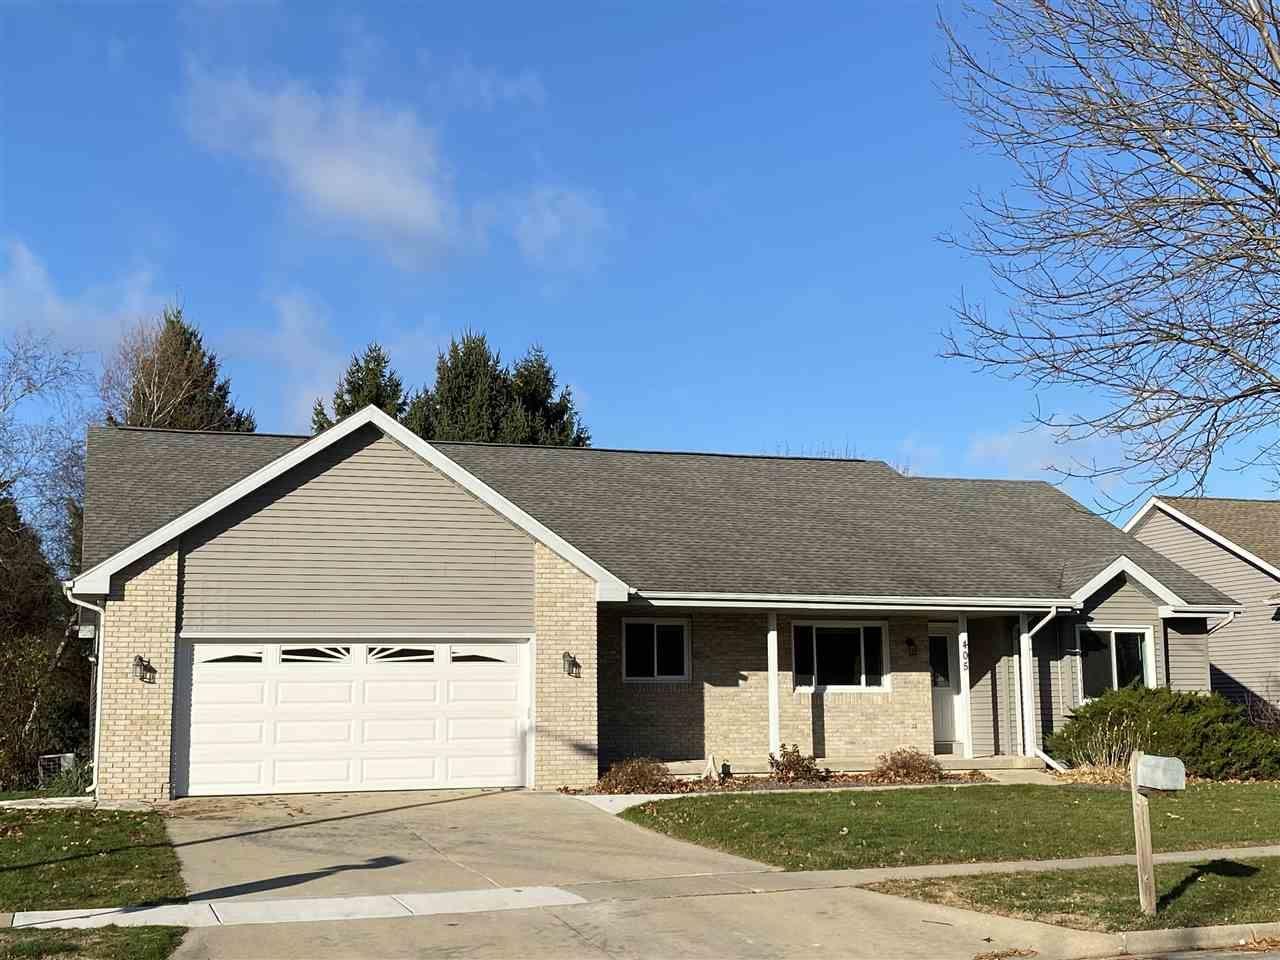 405 Bonnie Rd, Cottage Grove, WI 53527 - #: 1897872